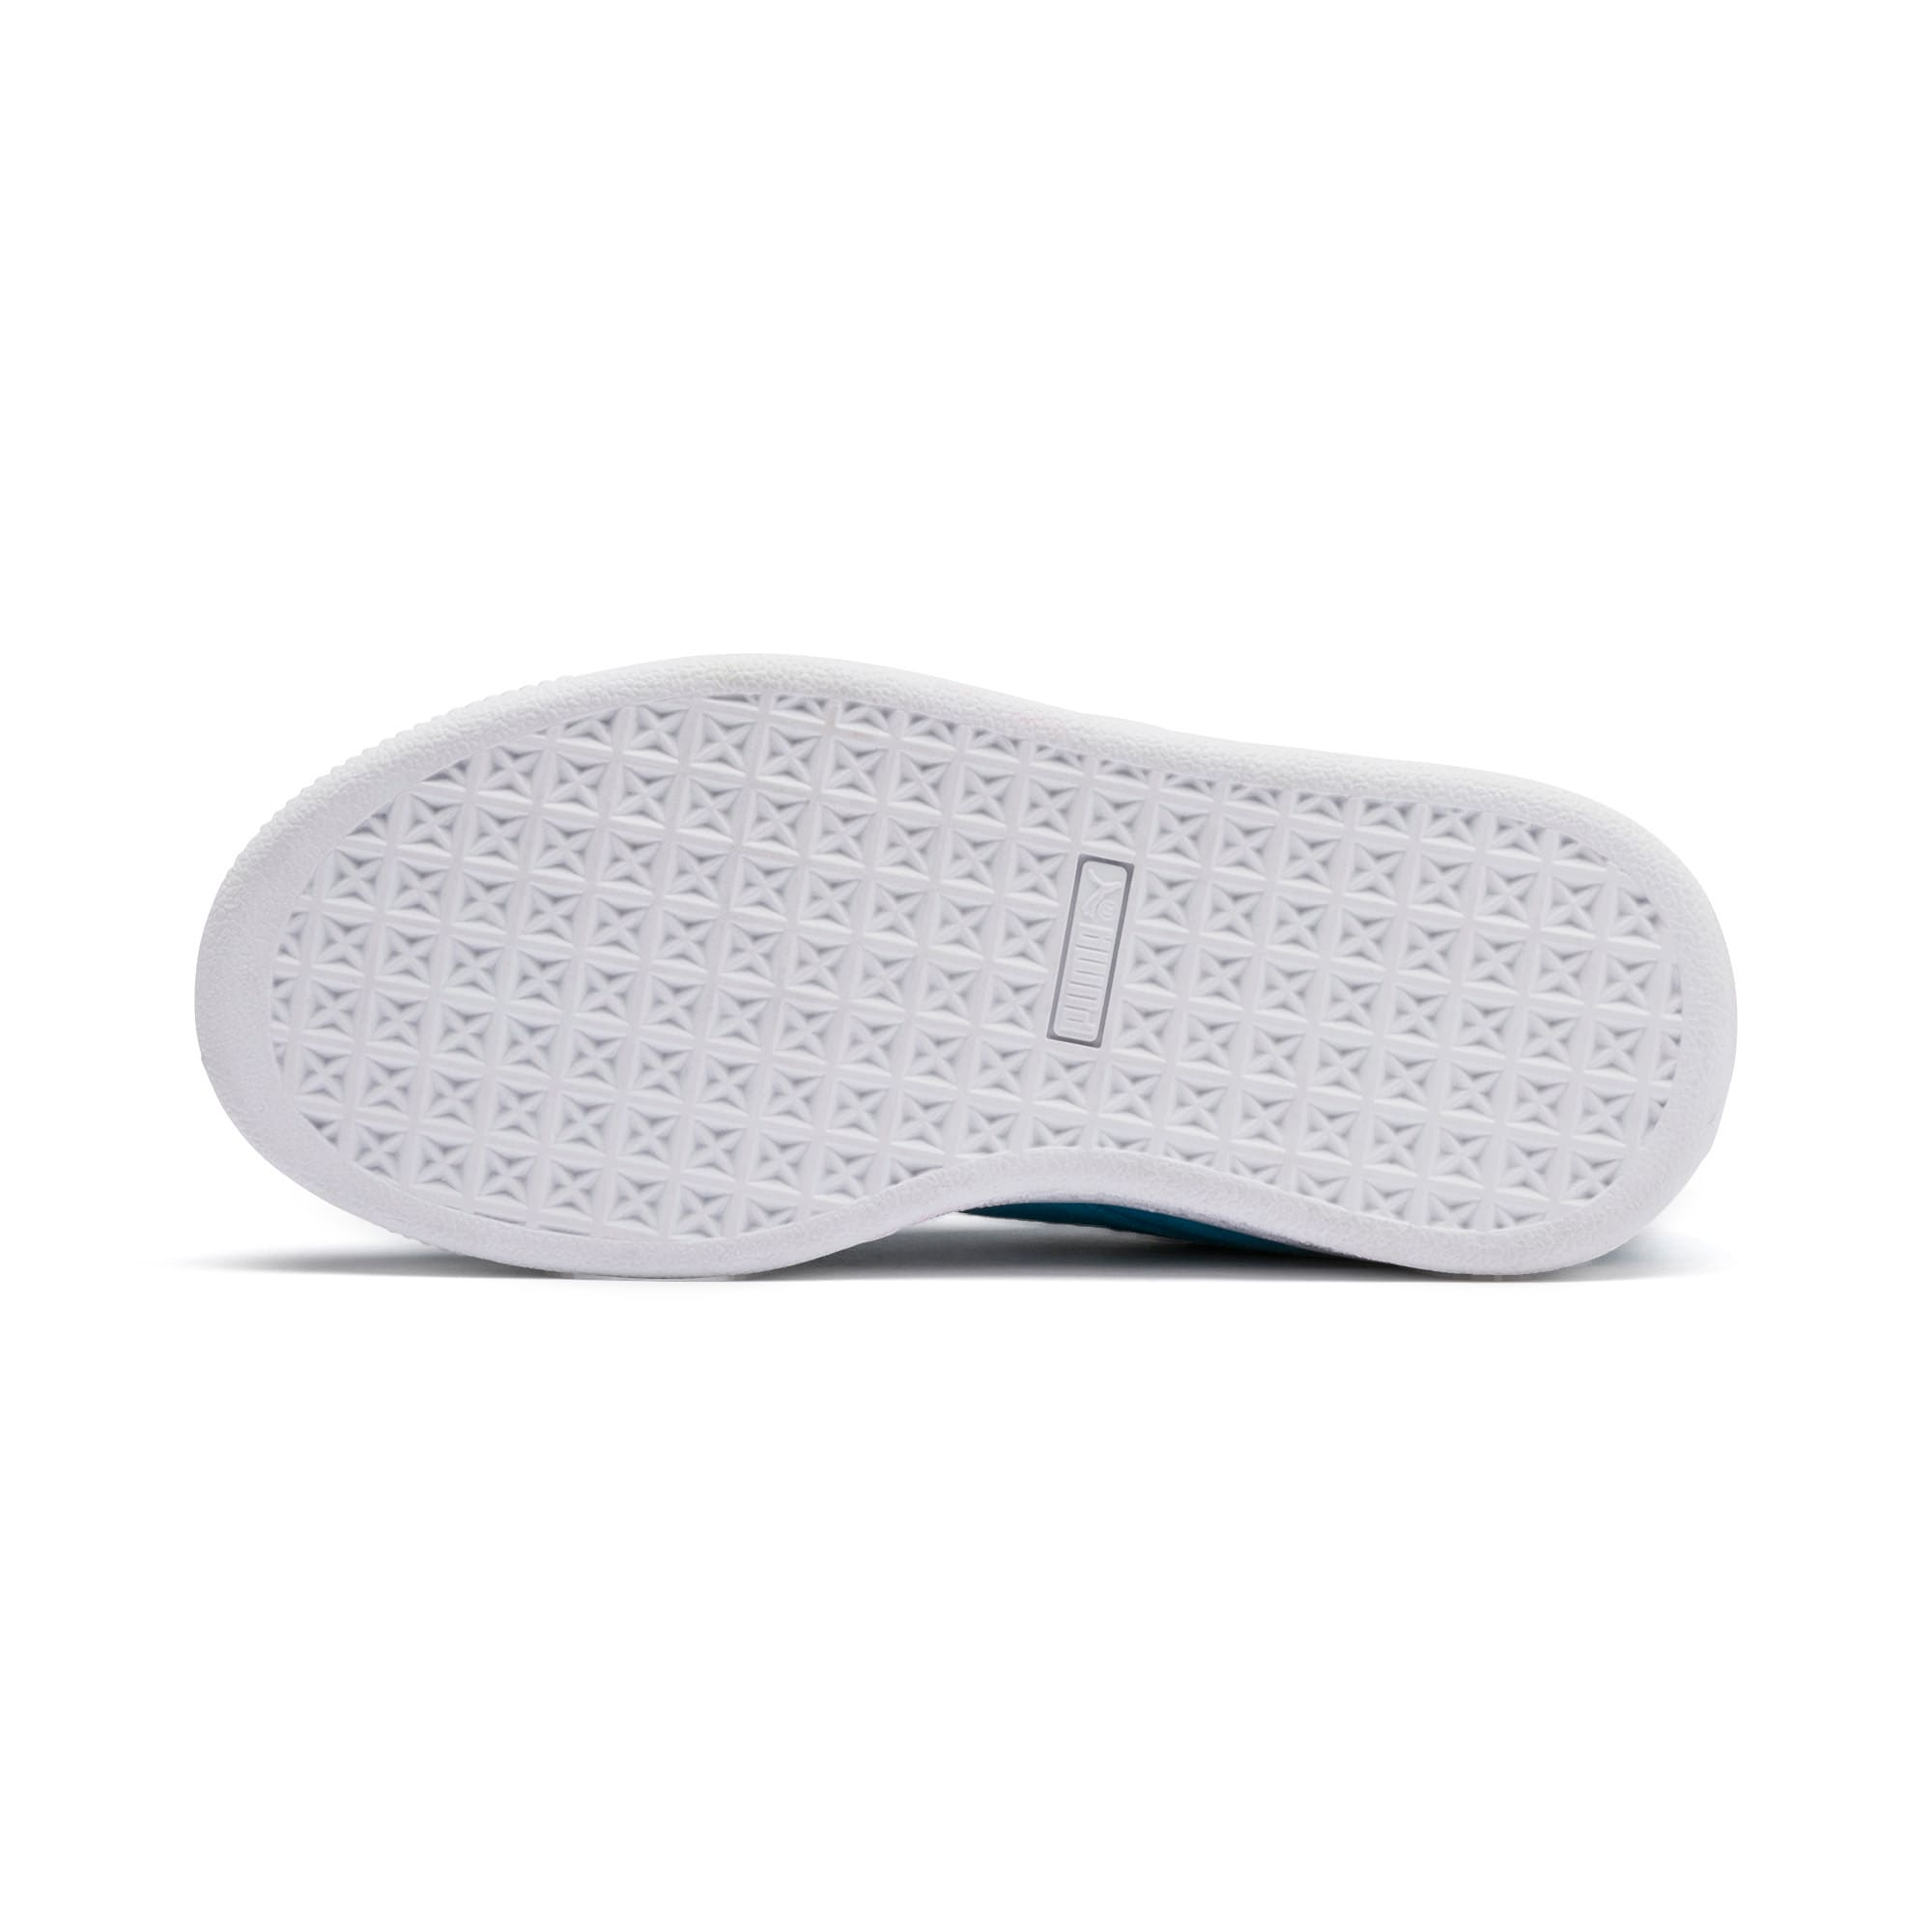 Thumbnail 4 of Sesamstraße 50 Suede Statement Kids Sneaker, Bleu Azur-Puma White, medium